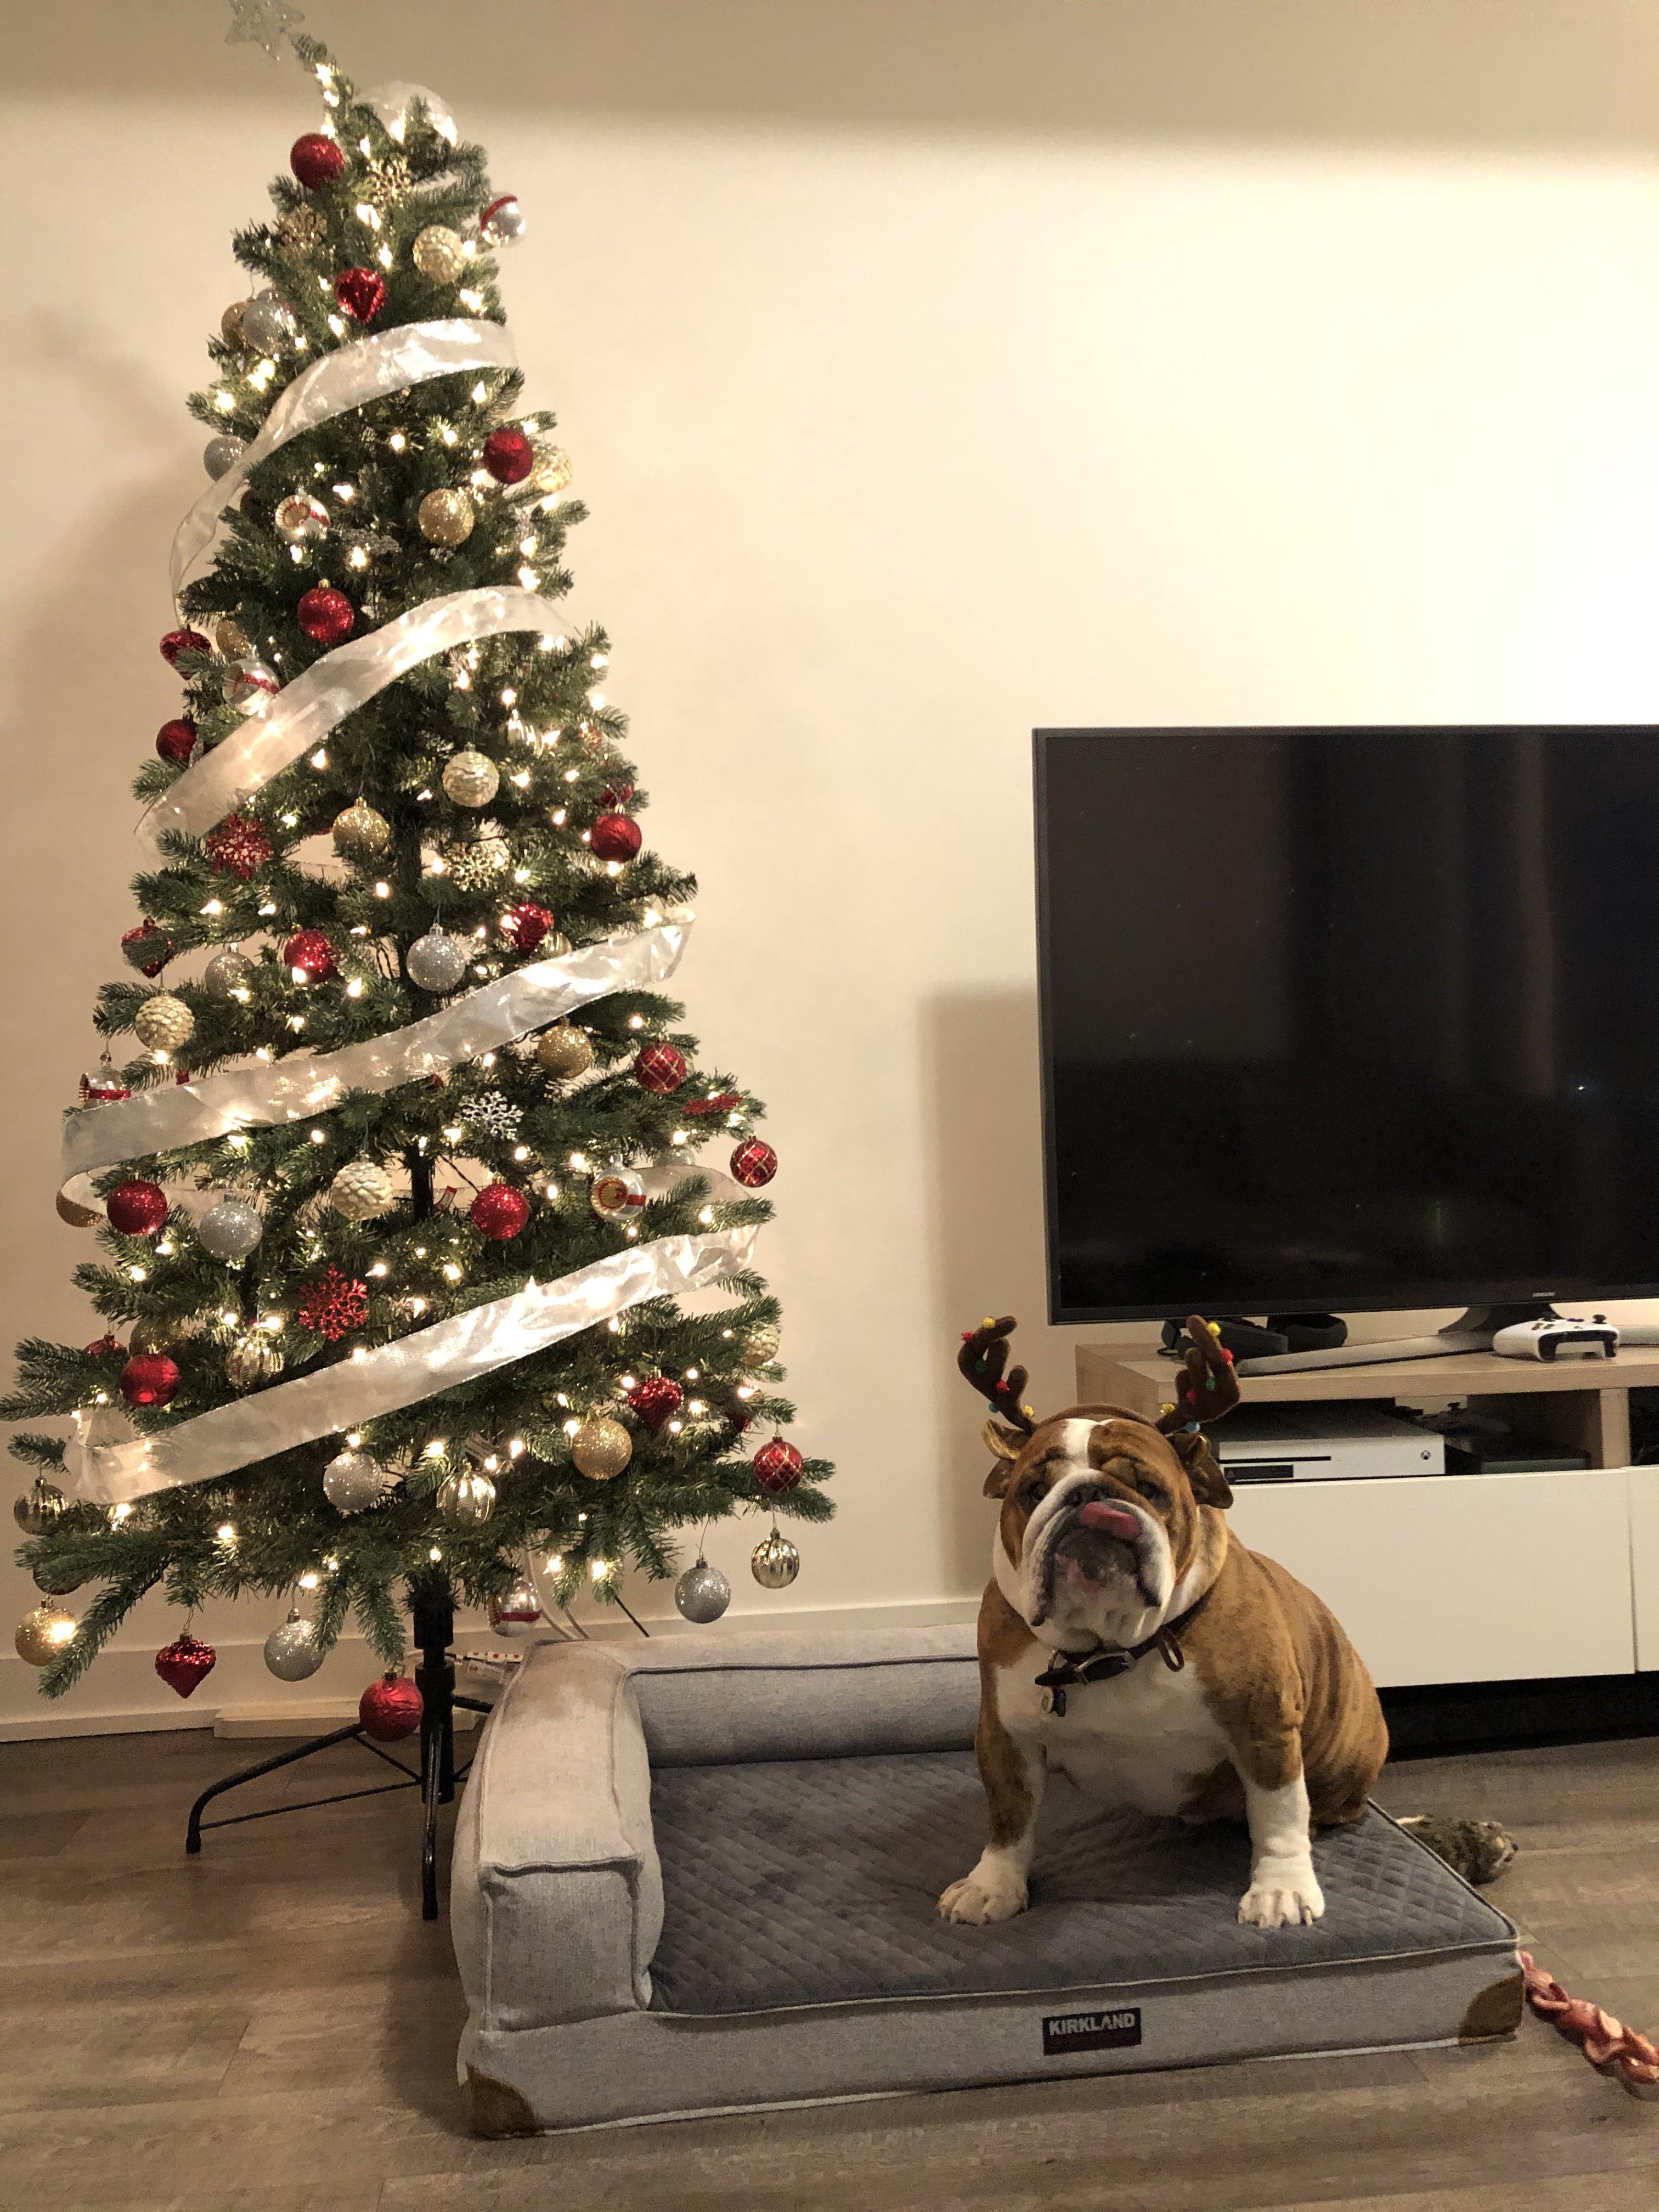 Hanks not feeling the holiday cheer